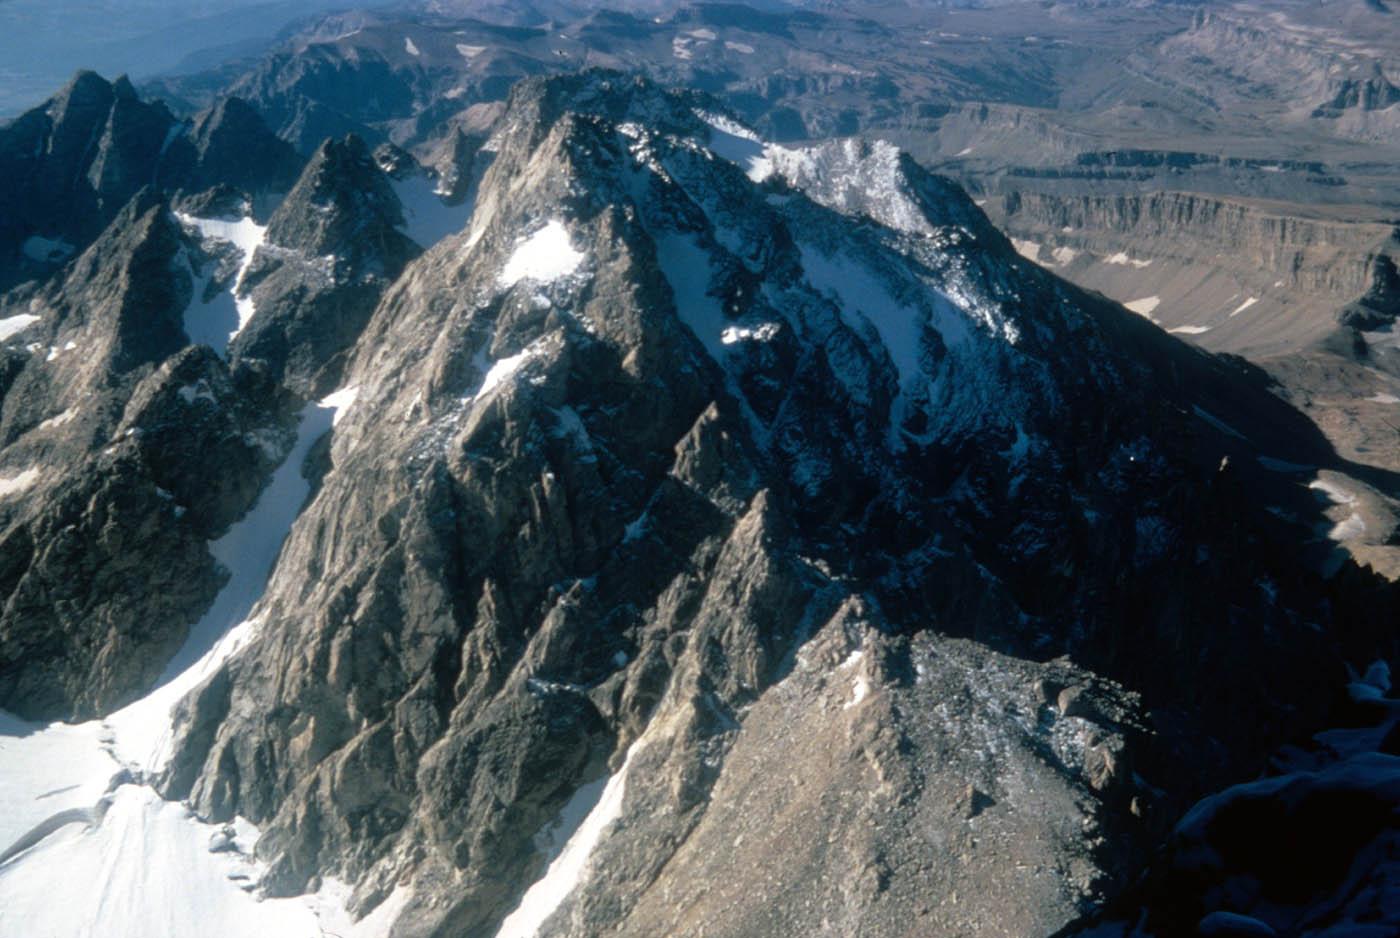 grand teton national park4 Spectacular Grand Teton National Park